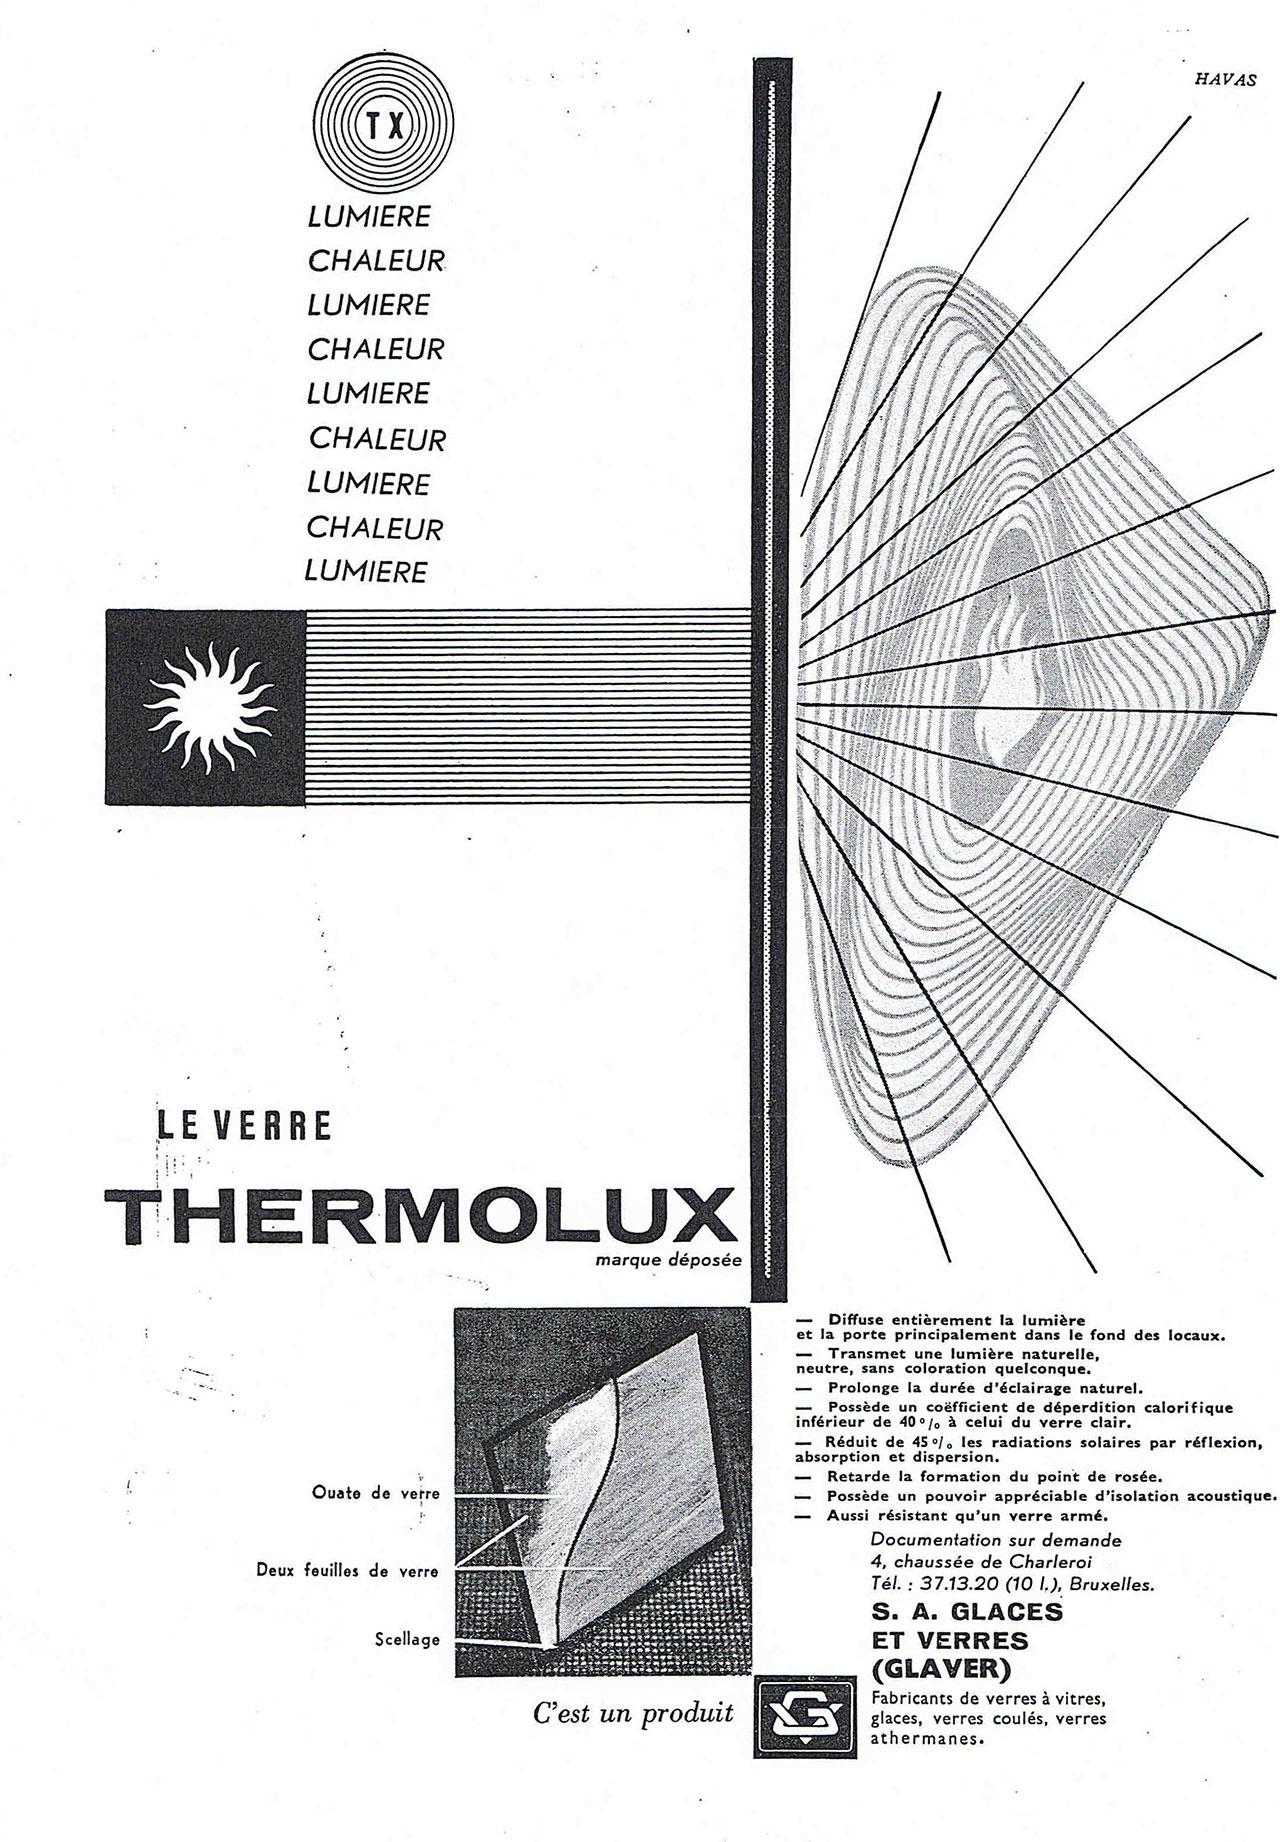 Thermolux